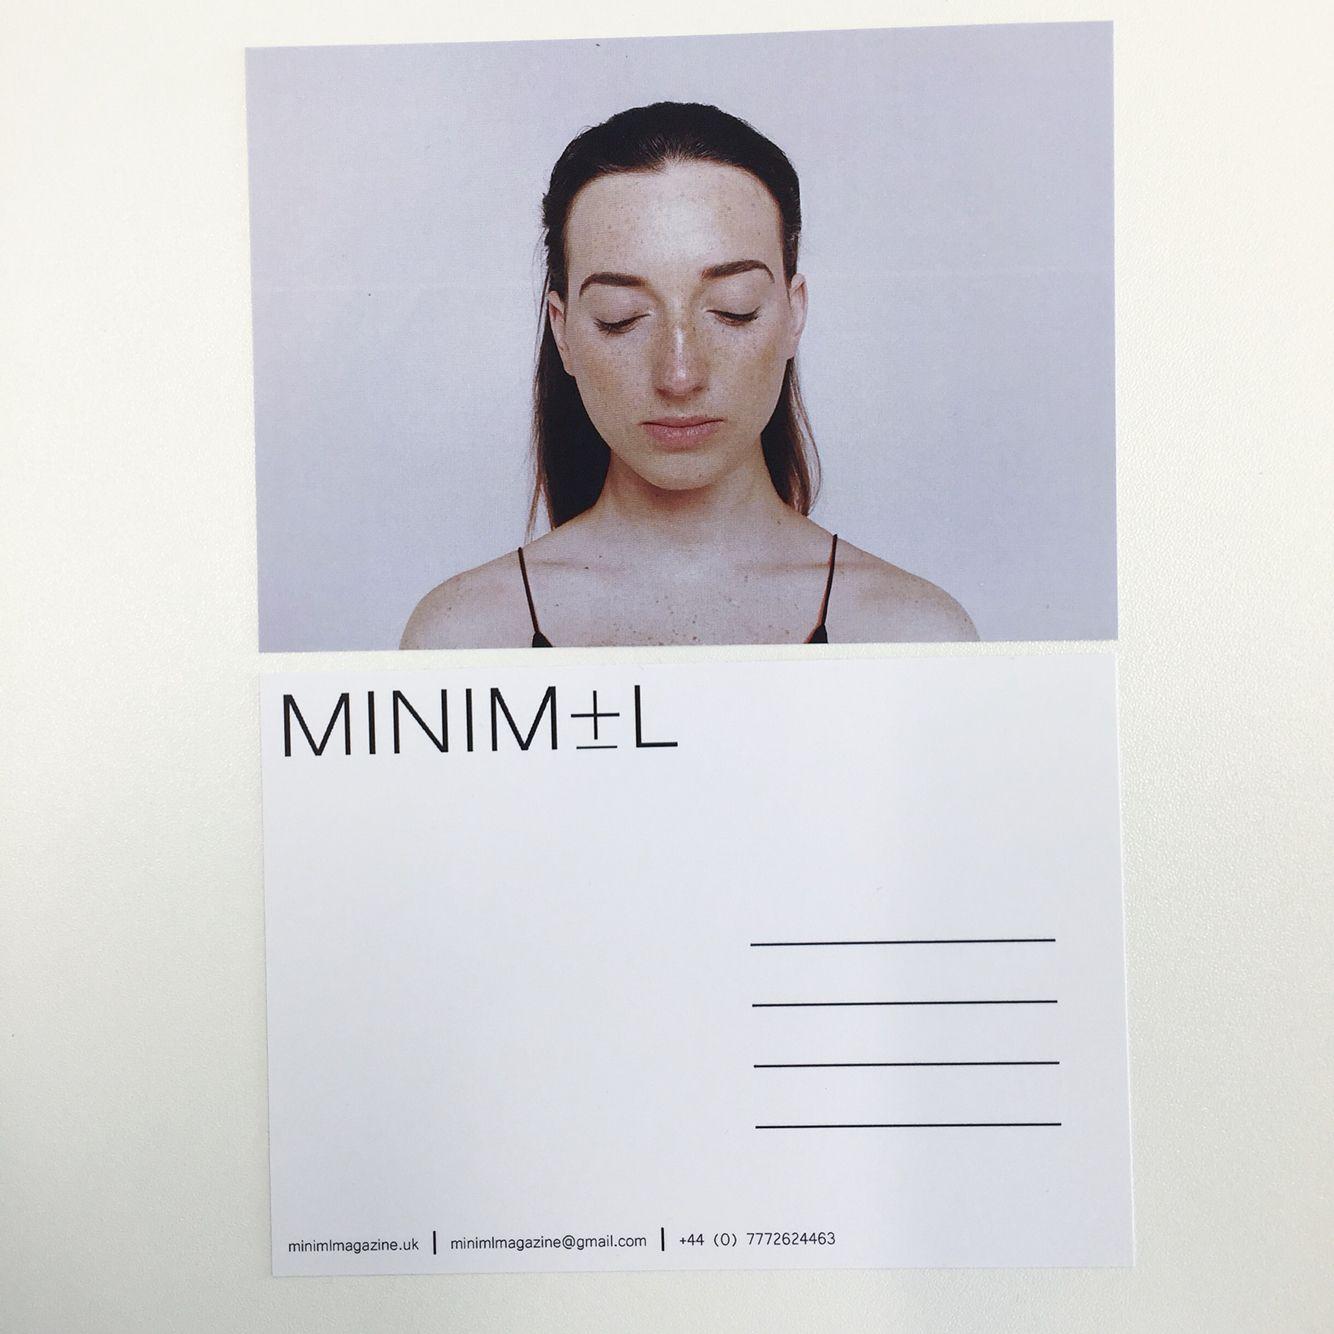 Minimal Magazine Promotional Postcards